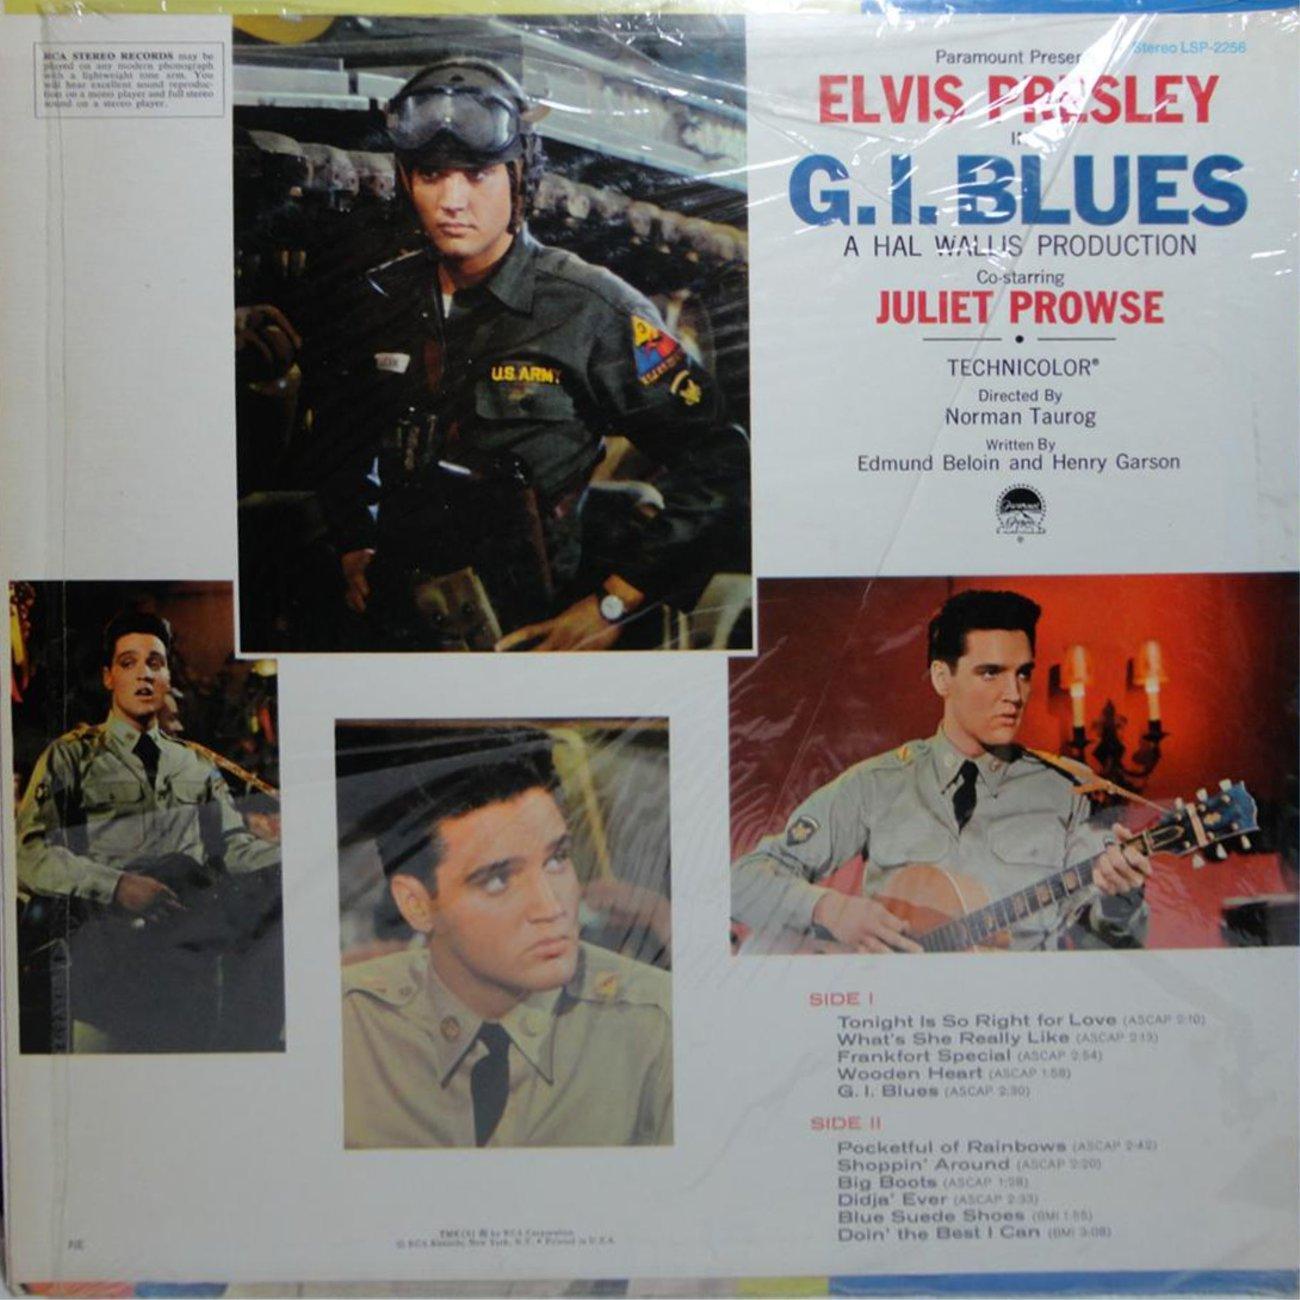 G.I.BLUES Lsp2256b0bu65